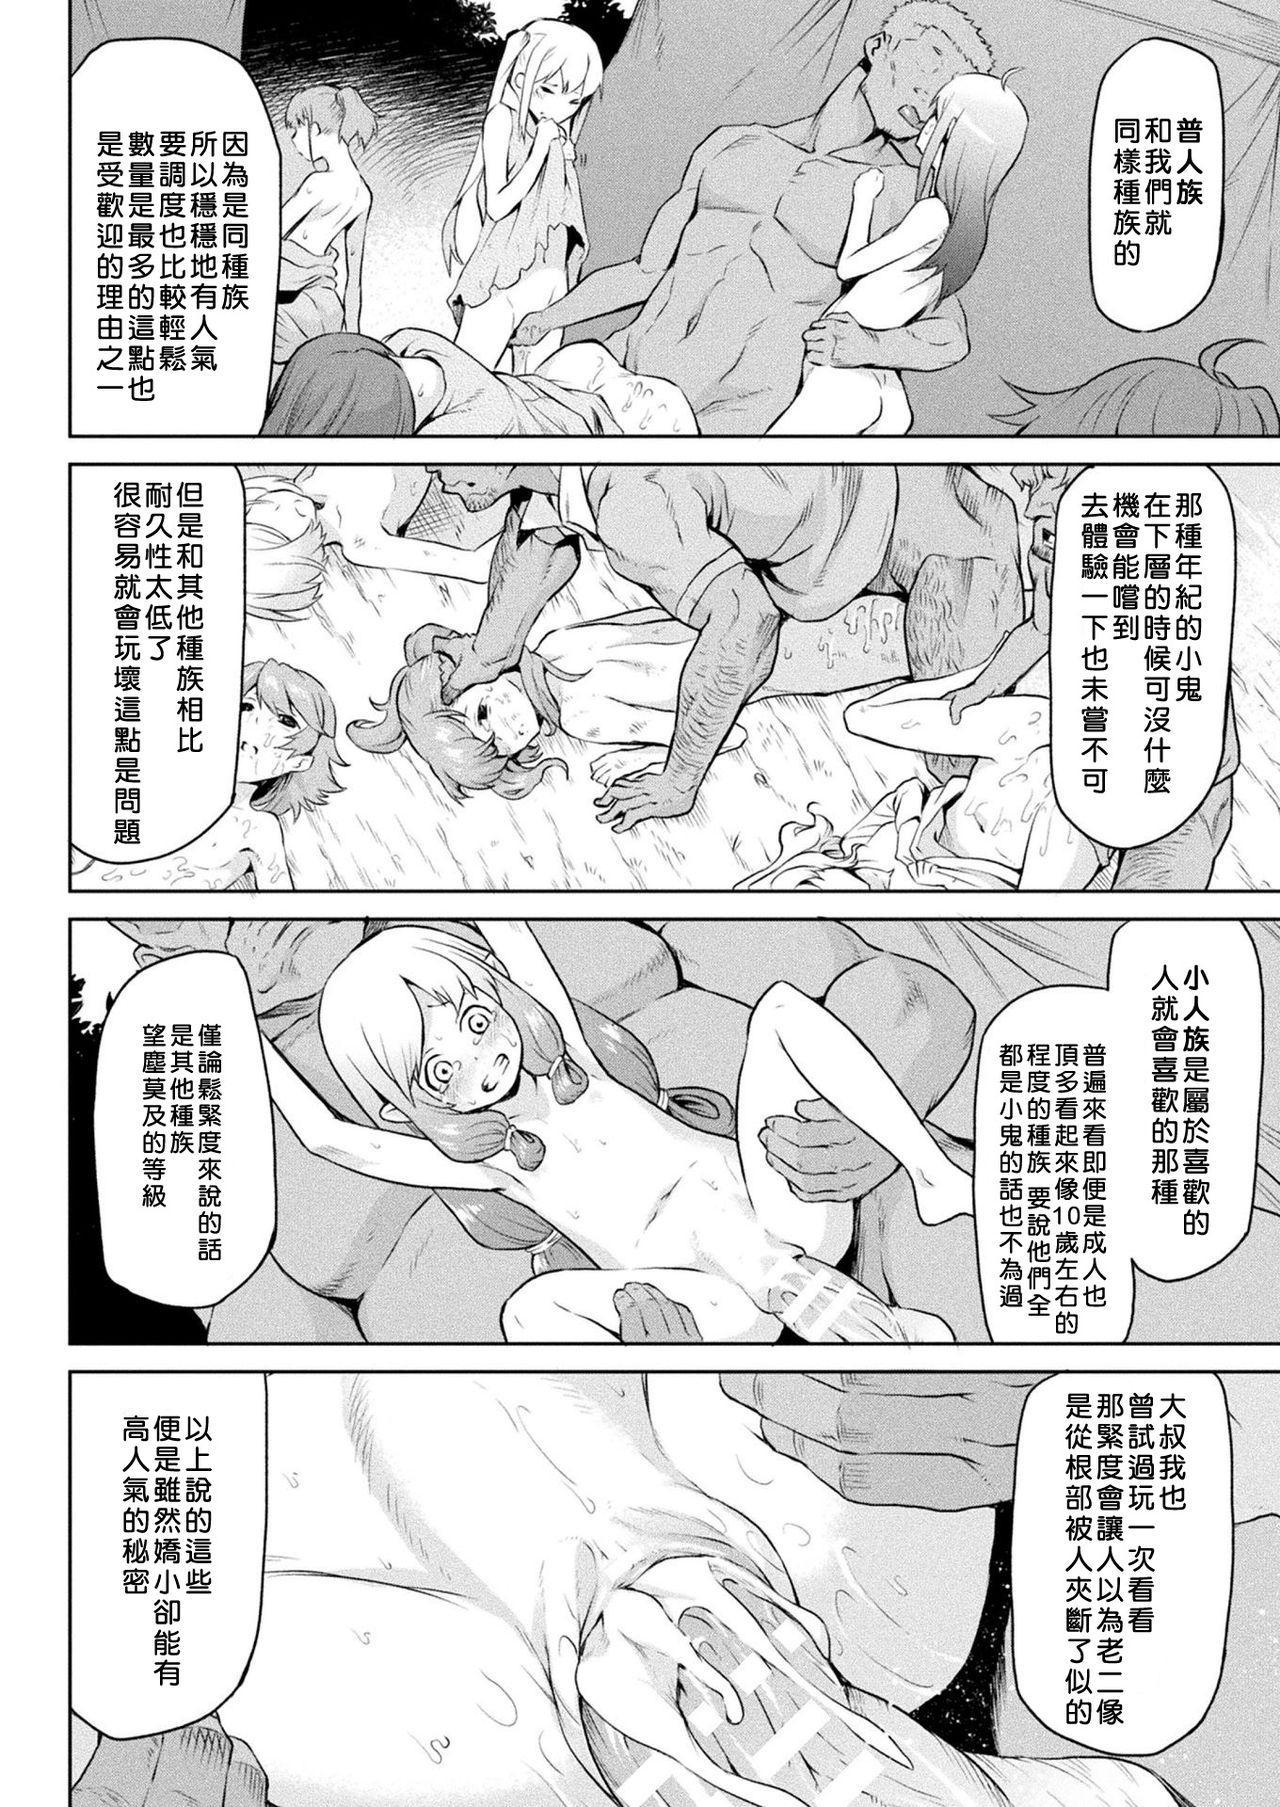 Kisei-jyu 39